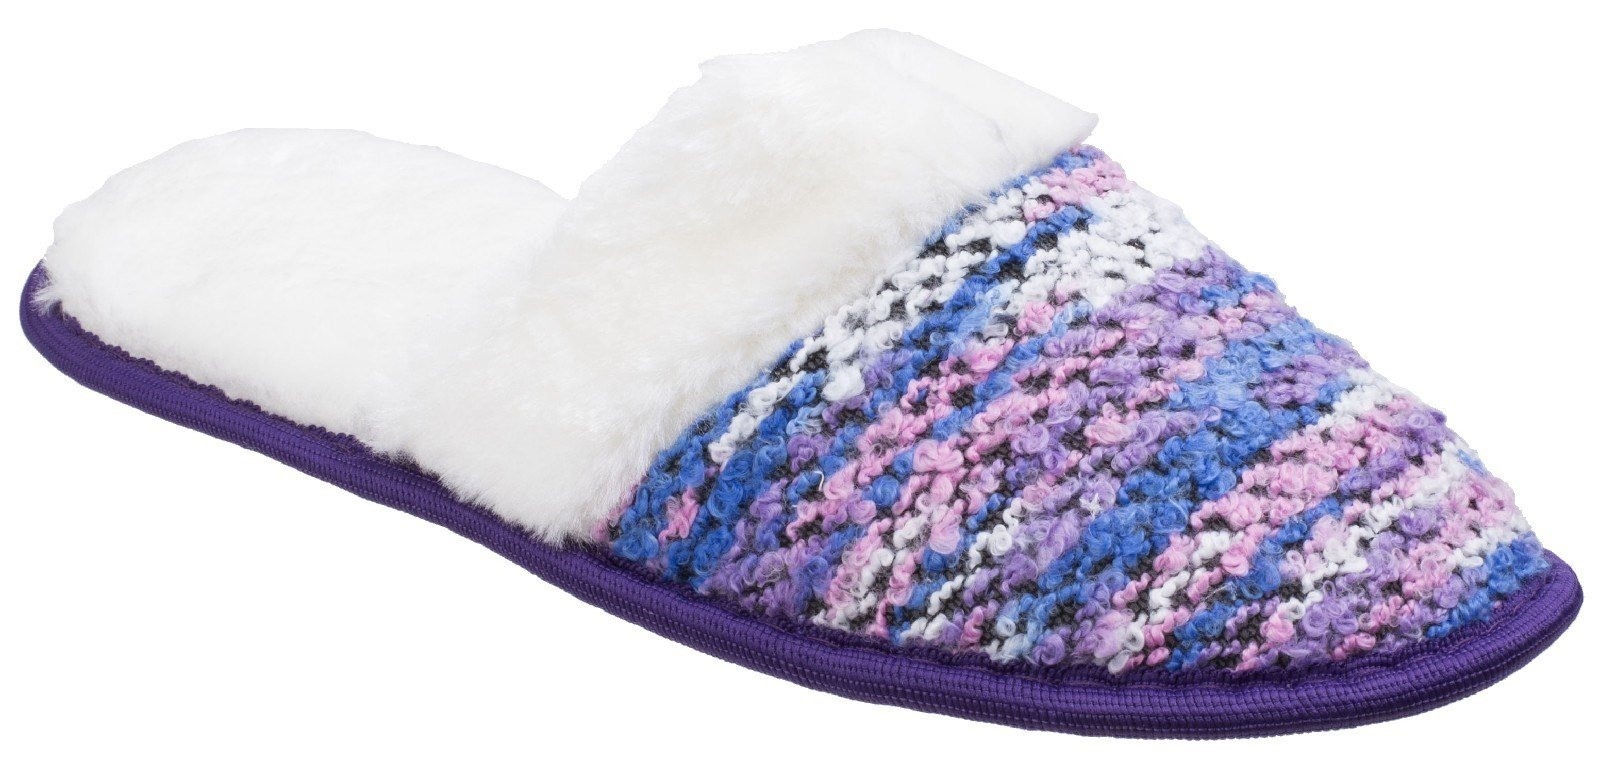 Divaz Women's Salzburg Knitted Mule Slipper Various Colours 25586 - Purple 4